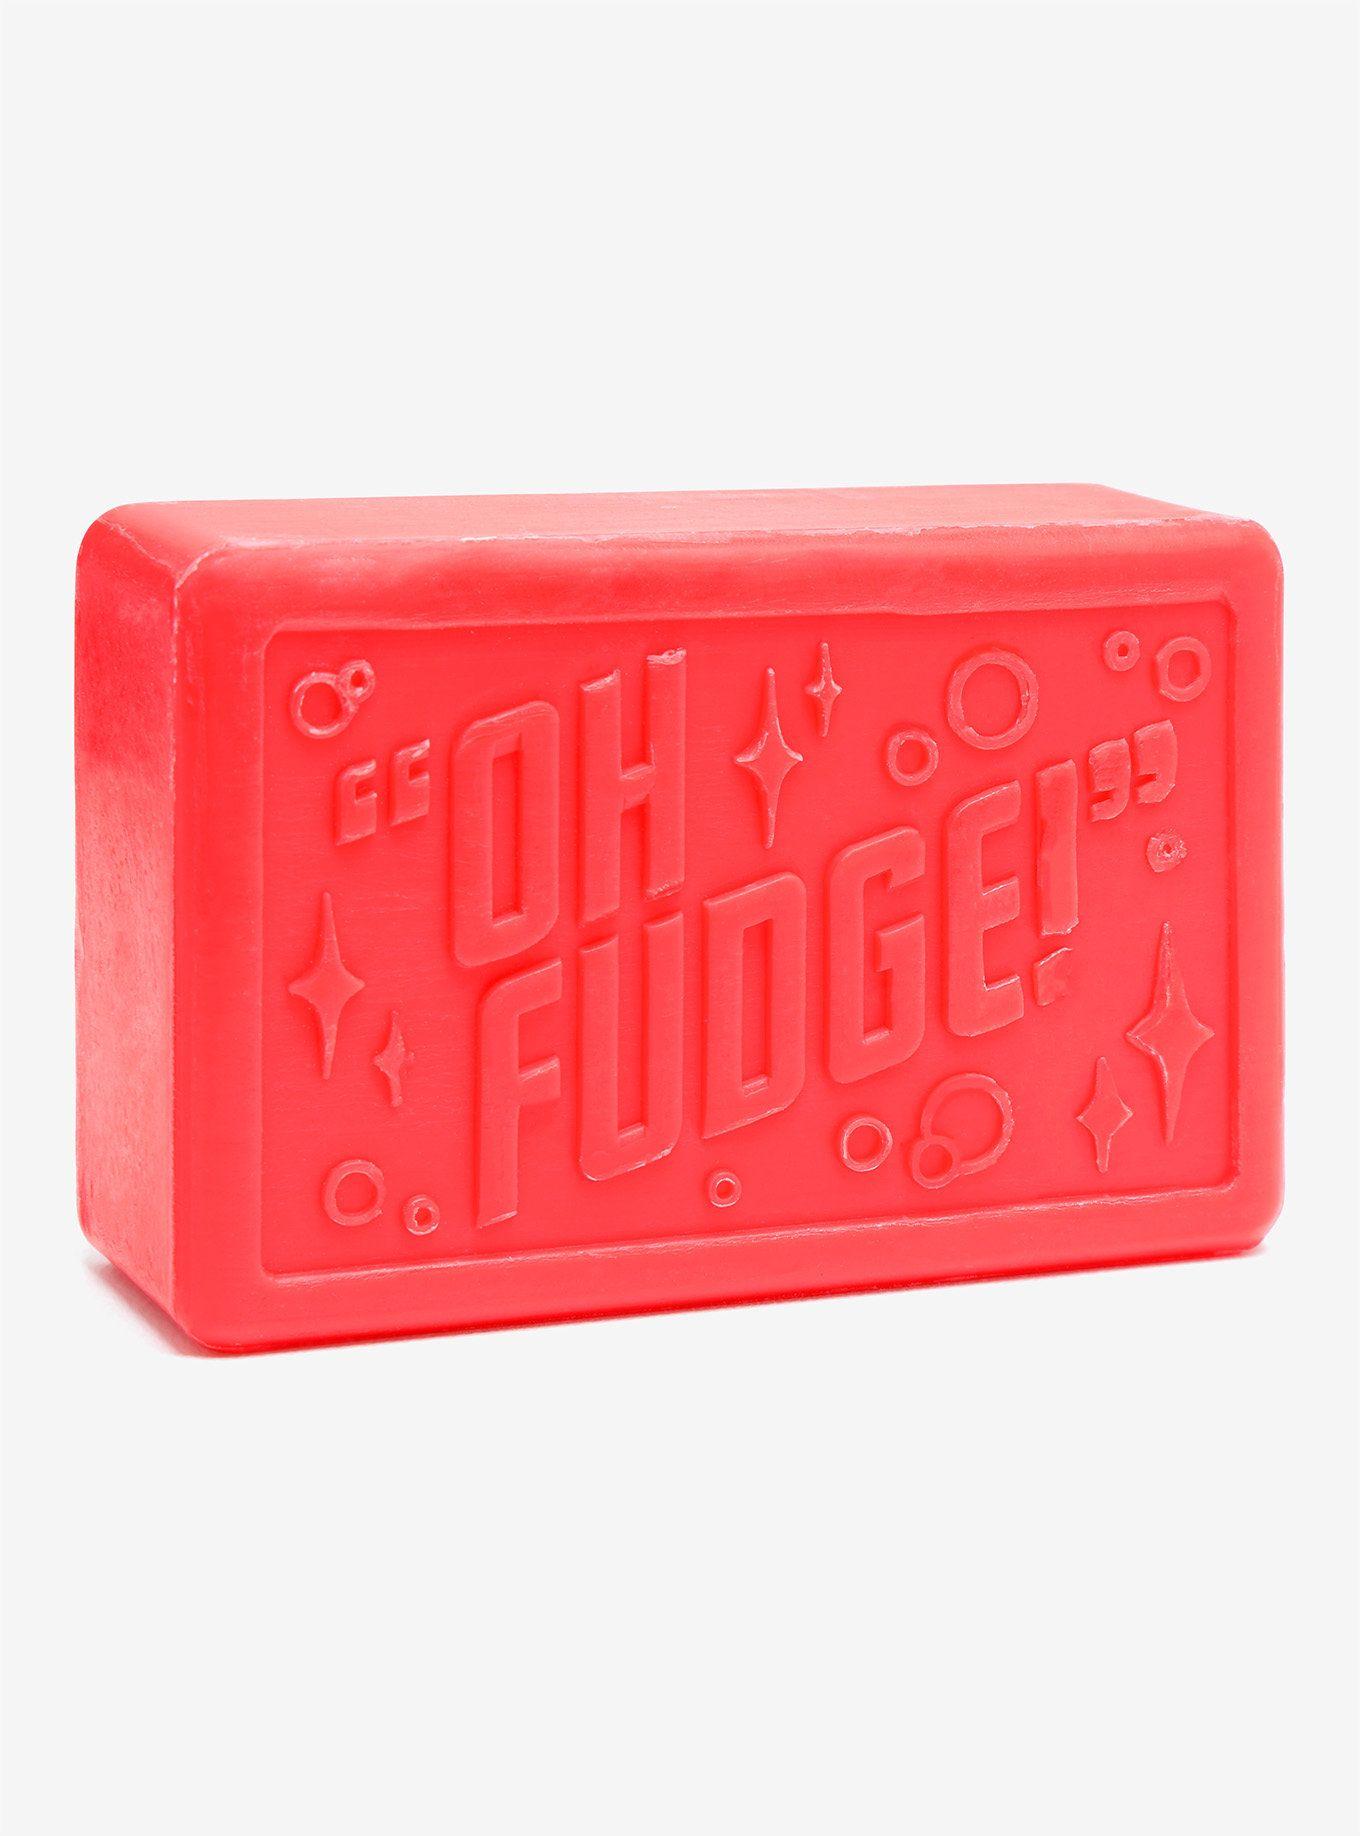 A Christmas Story Oh Fudge Soap Bar   Stocking Stuffers!   Pinterest ...